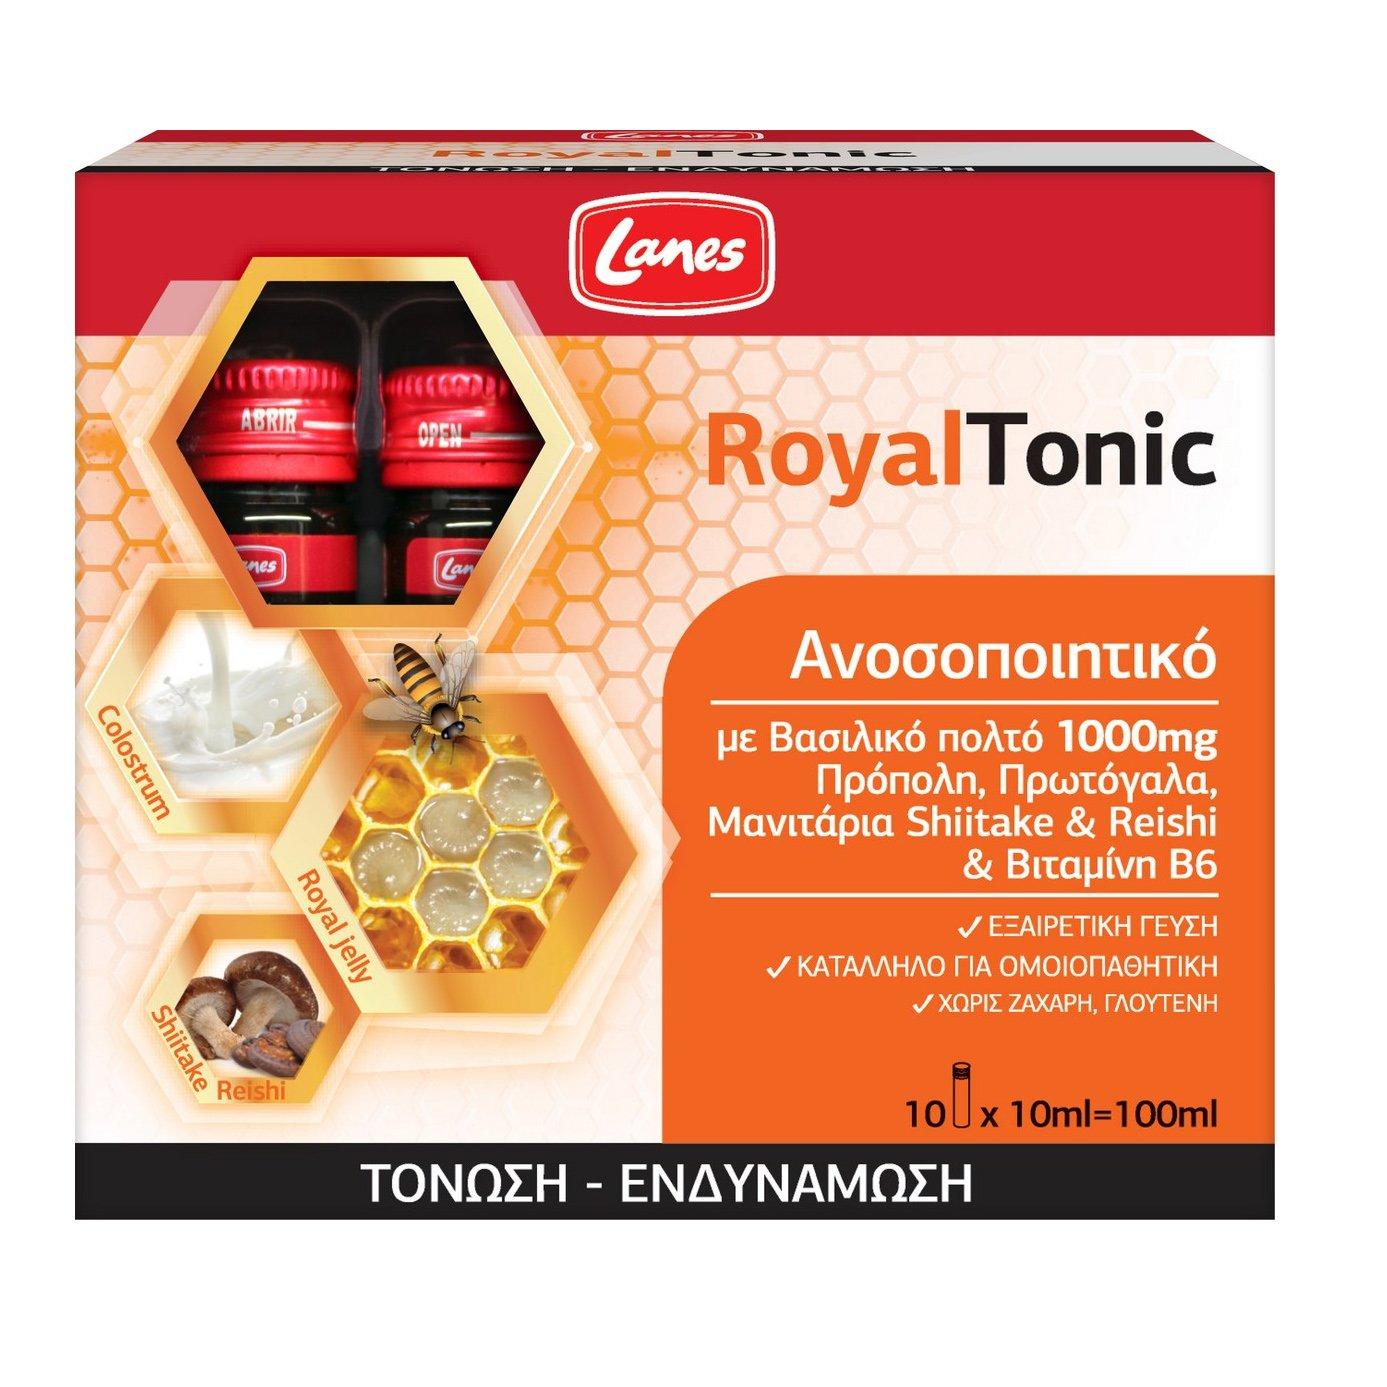 Lanes Royal Tonic Μονοδόσεις για Ενίσχυση του Ανοσοποιητικού 10 Φιαλίδια x 10m